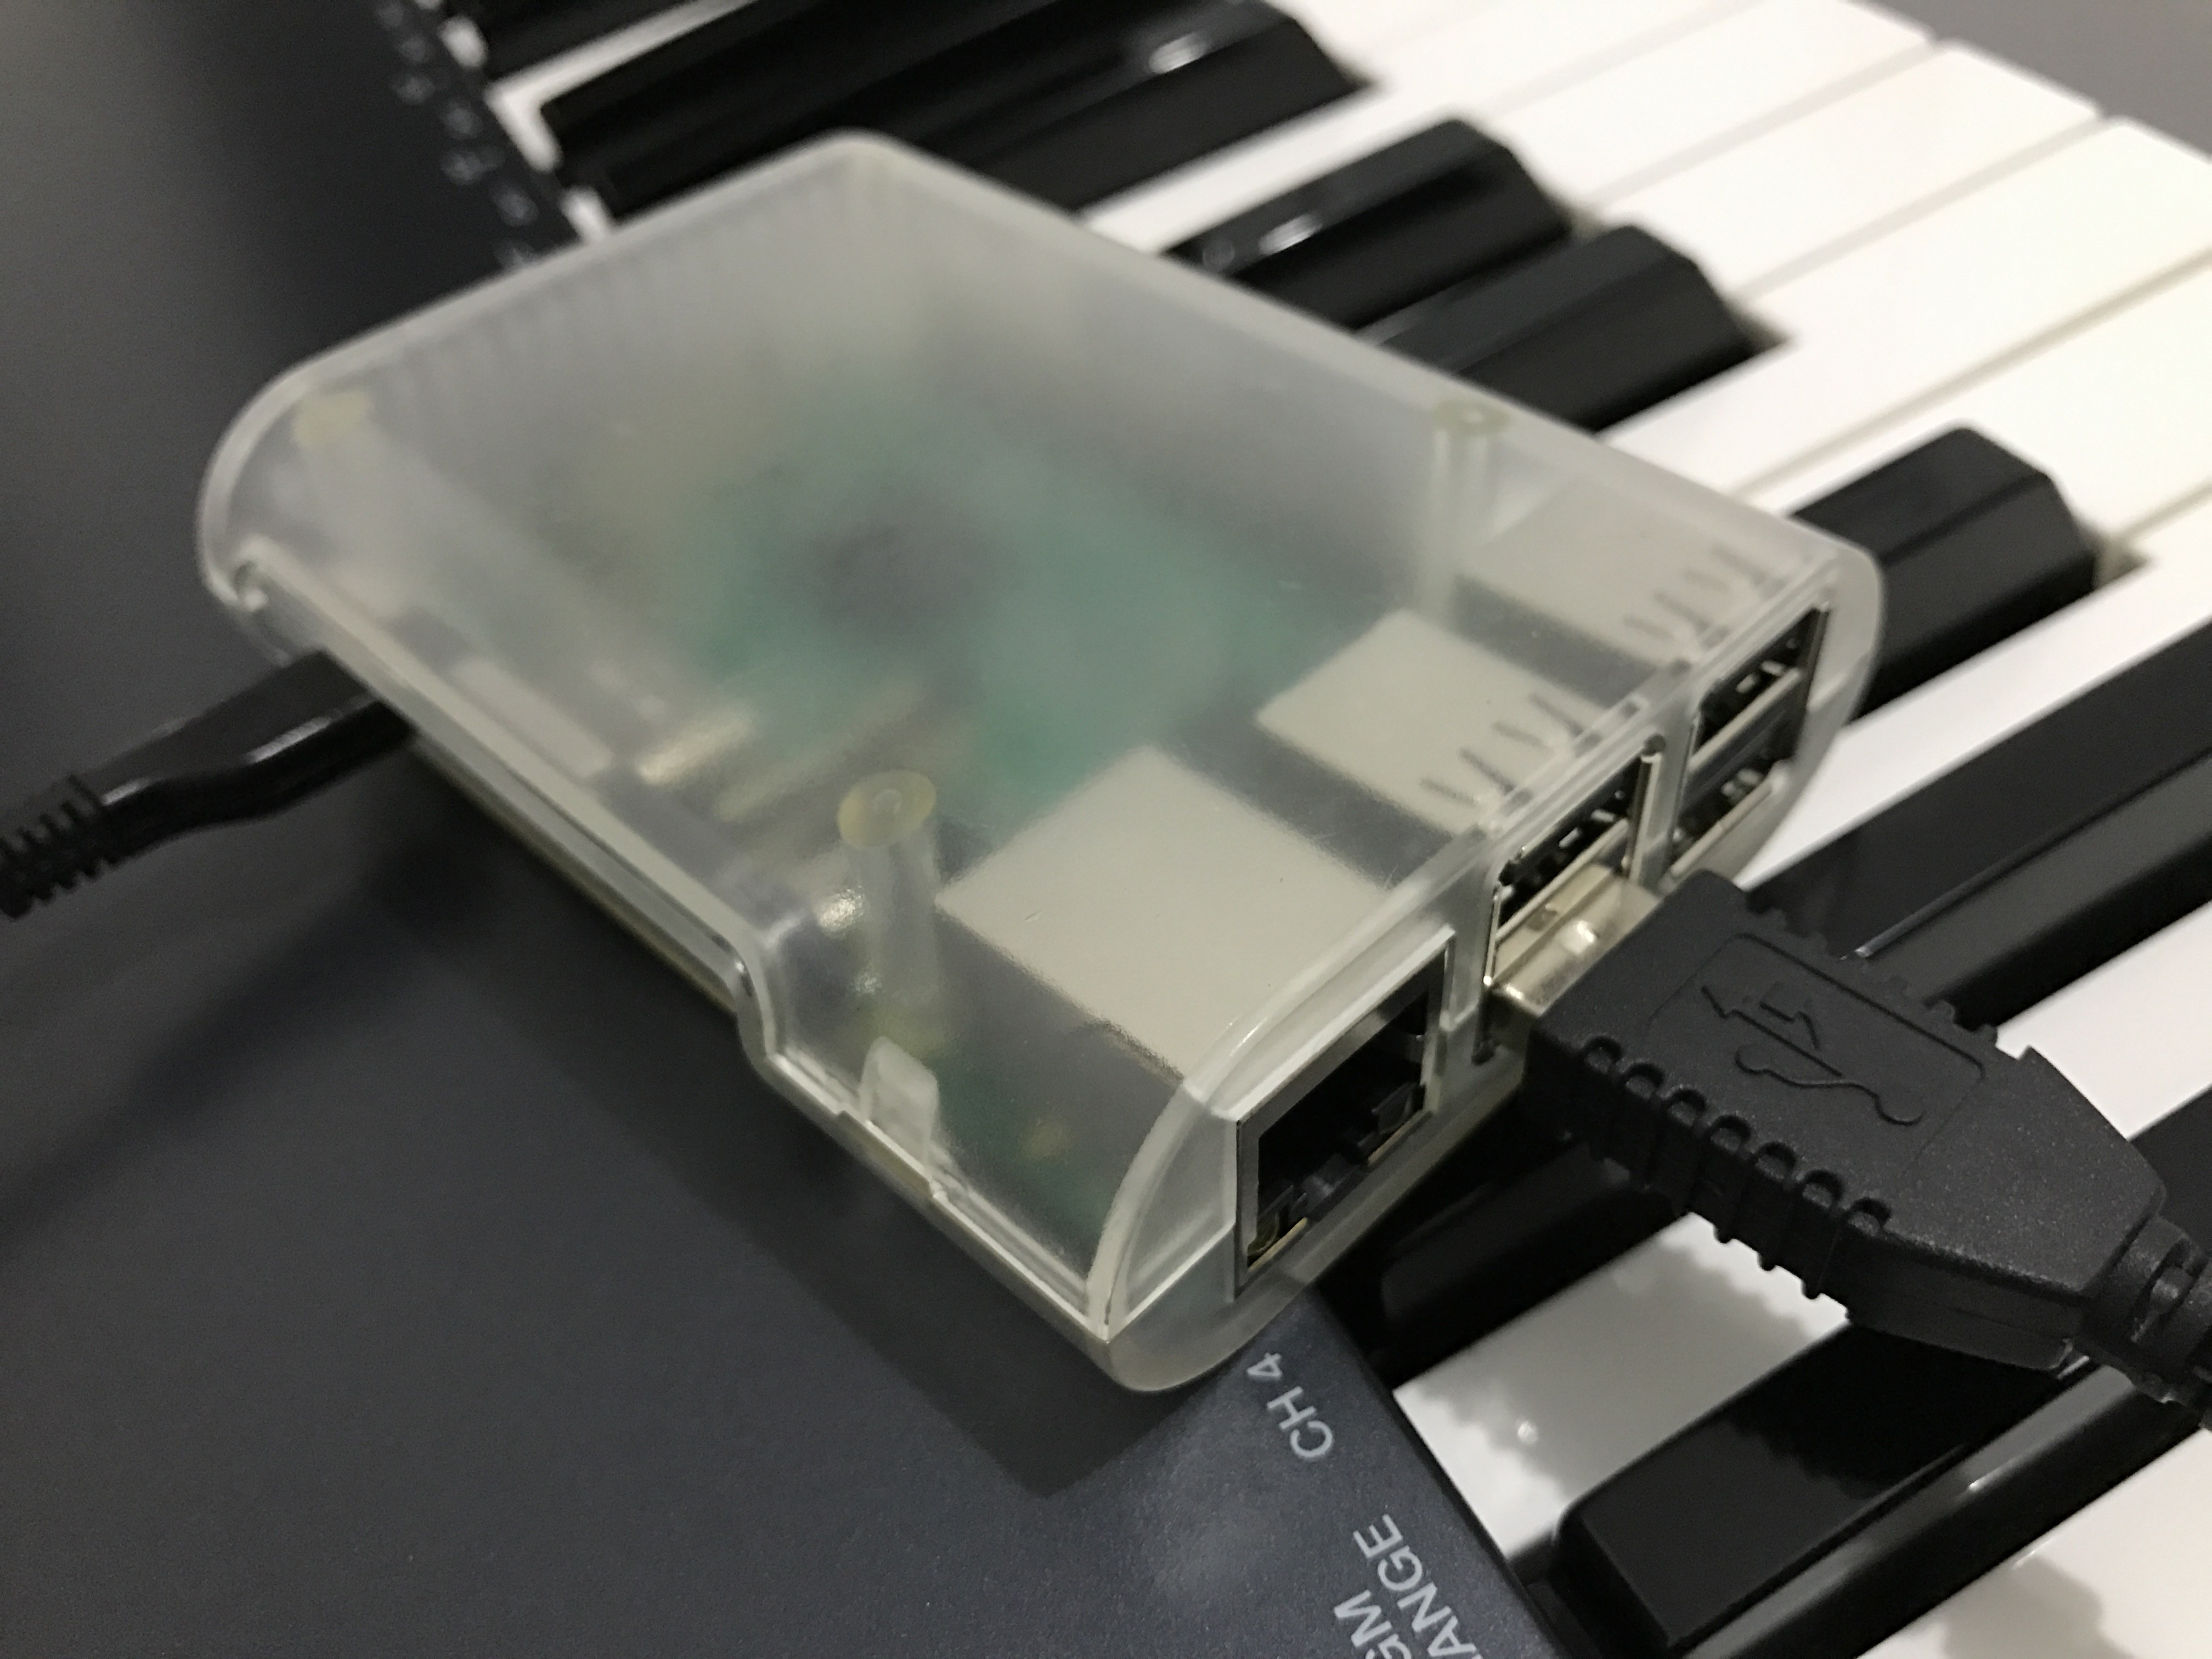 GitHub - oxesoft/rpi-midi-ble: Raspberry Pi 3 as an USB-MIDI over